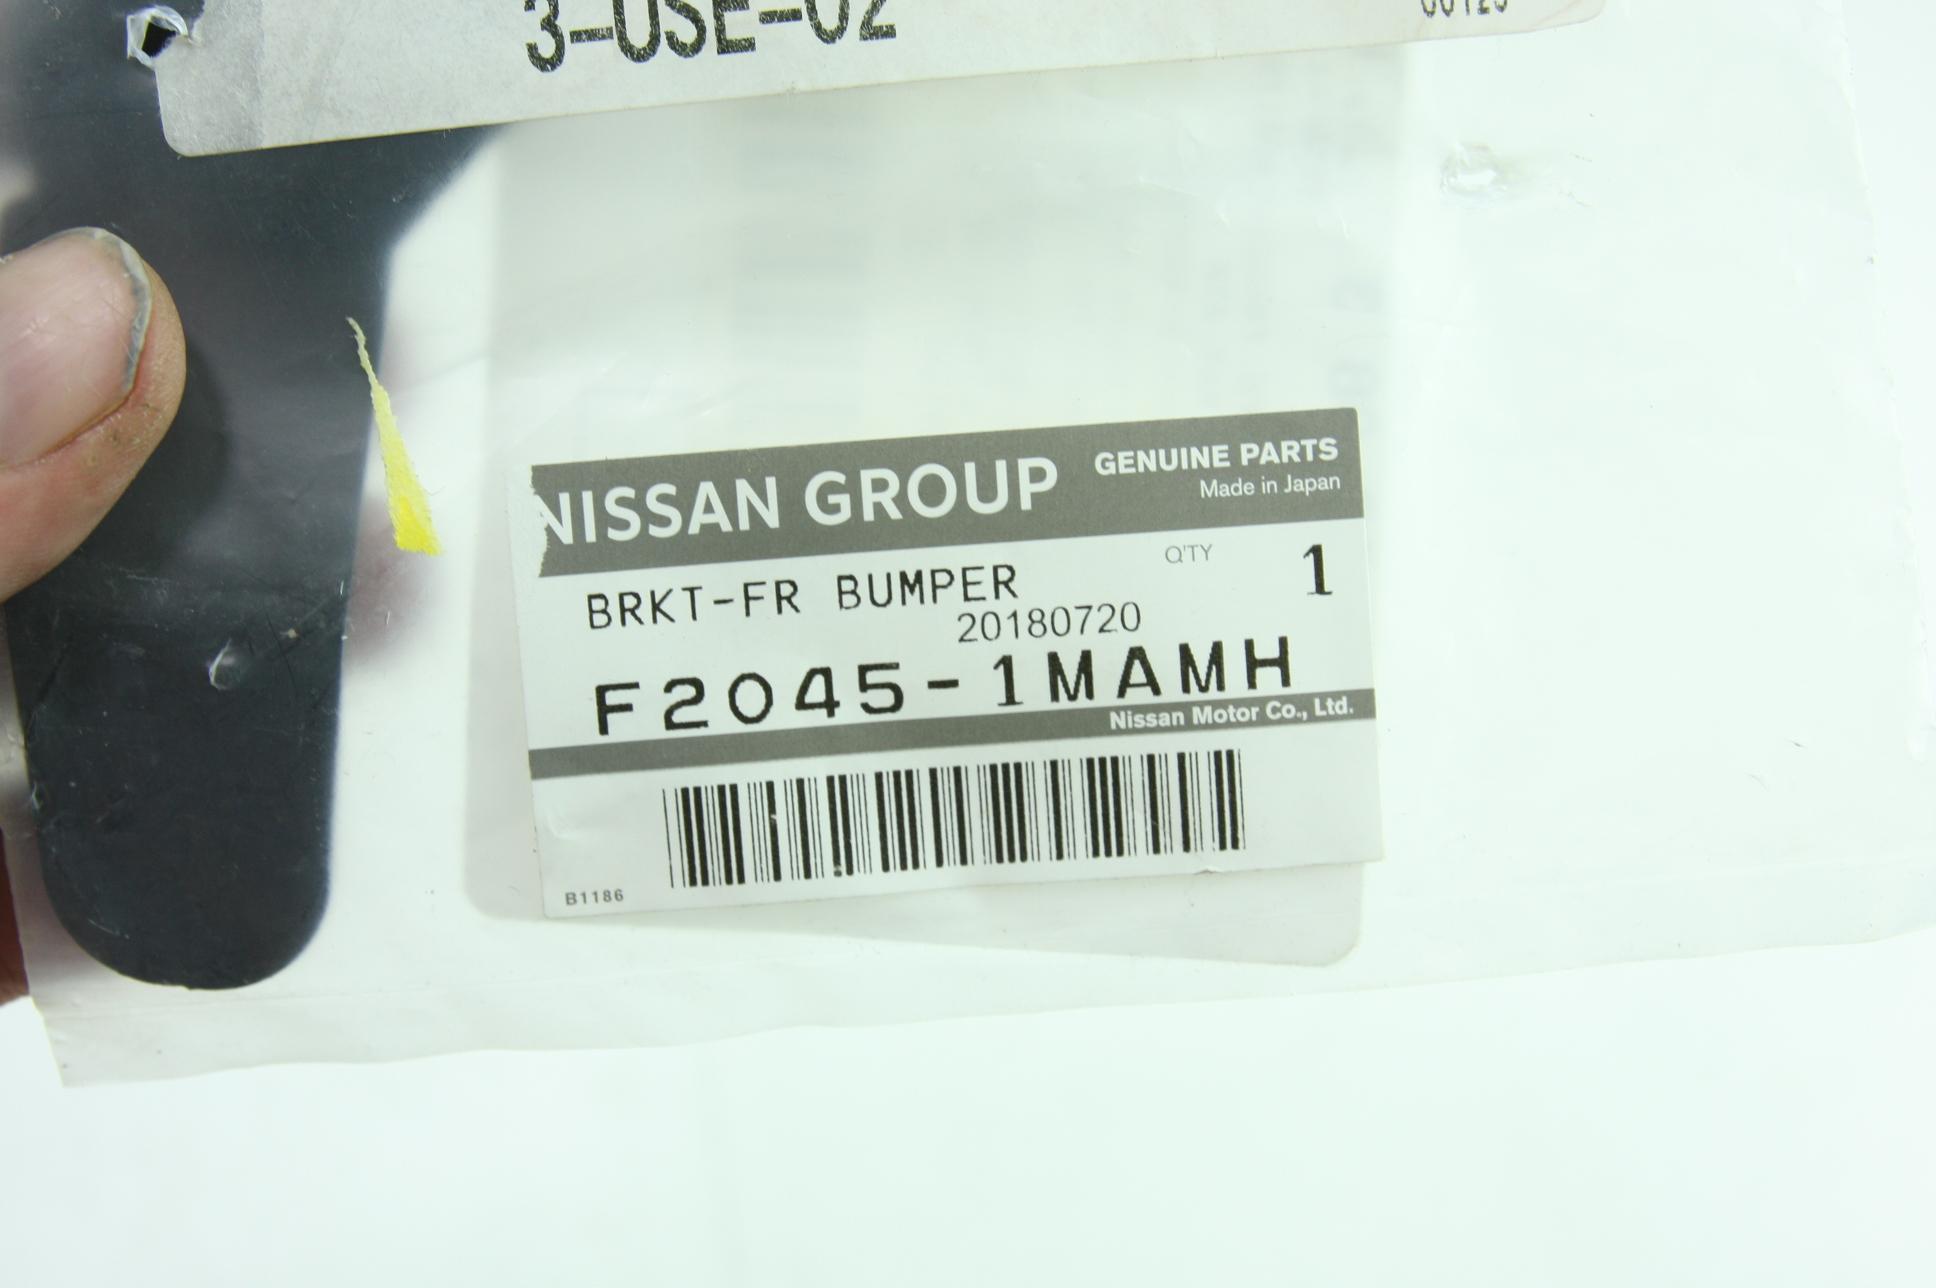 ** New OEM F2045-1MAMH Genuine Nissan Infiniti Upper Retainer Fast Free Shipping - image 2